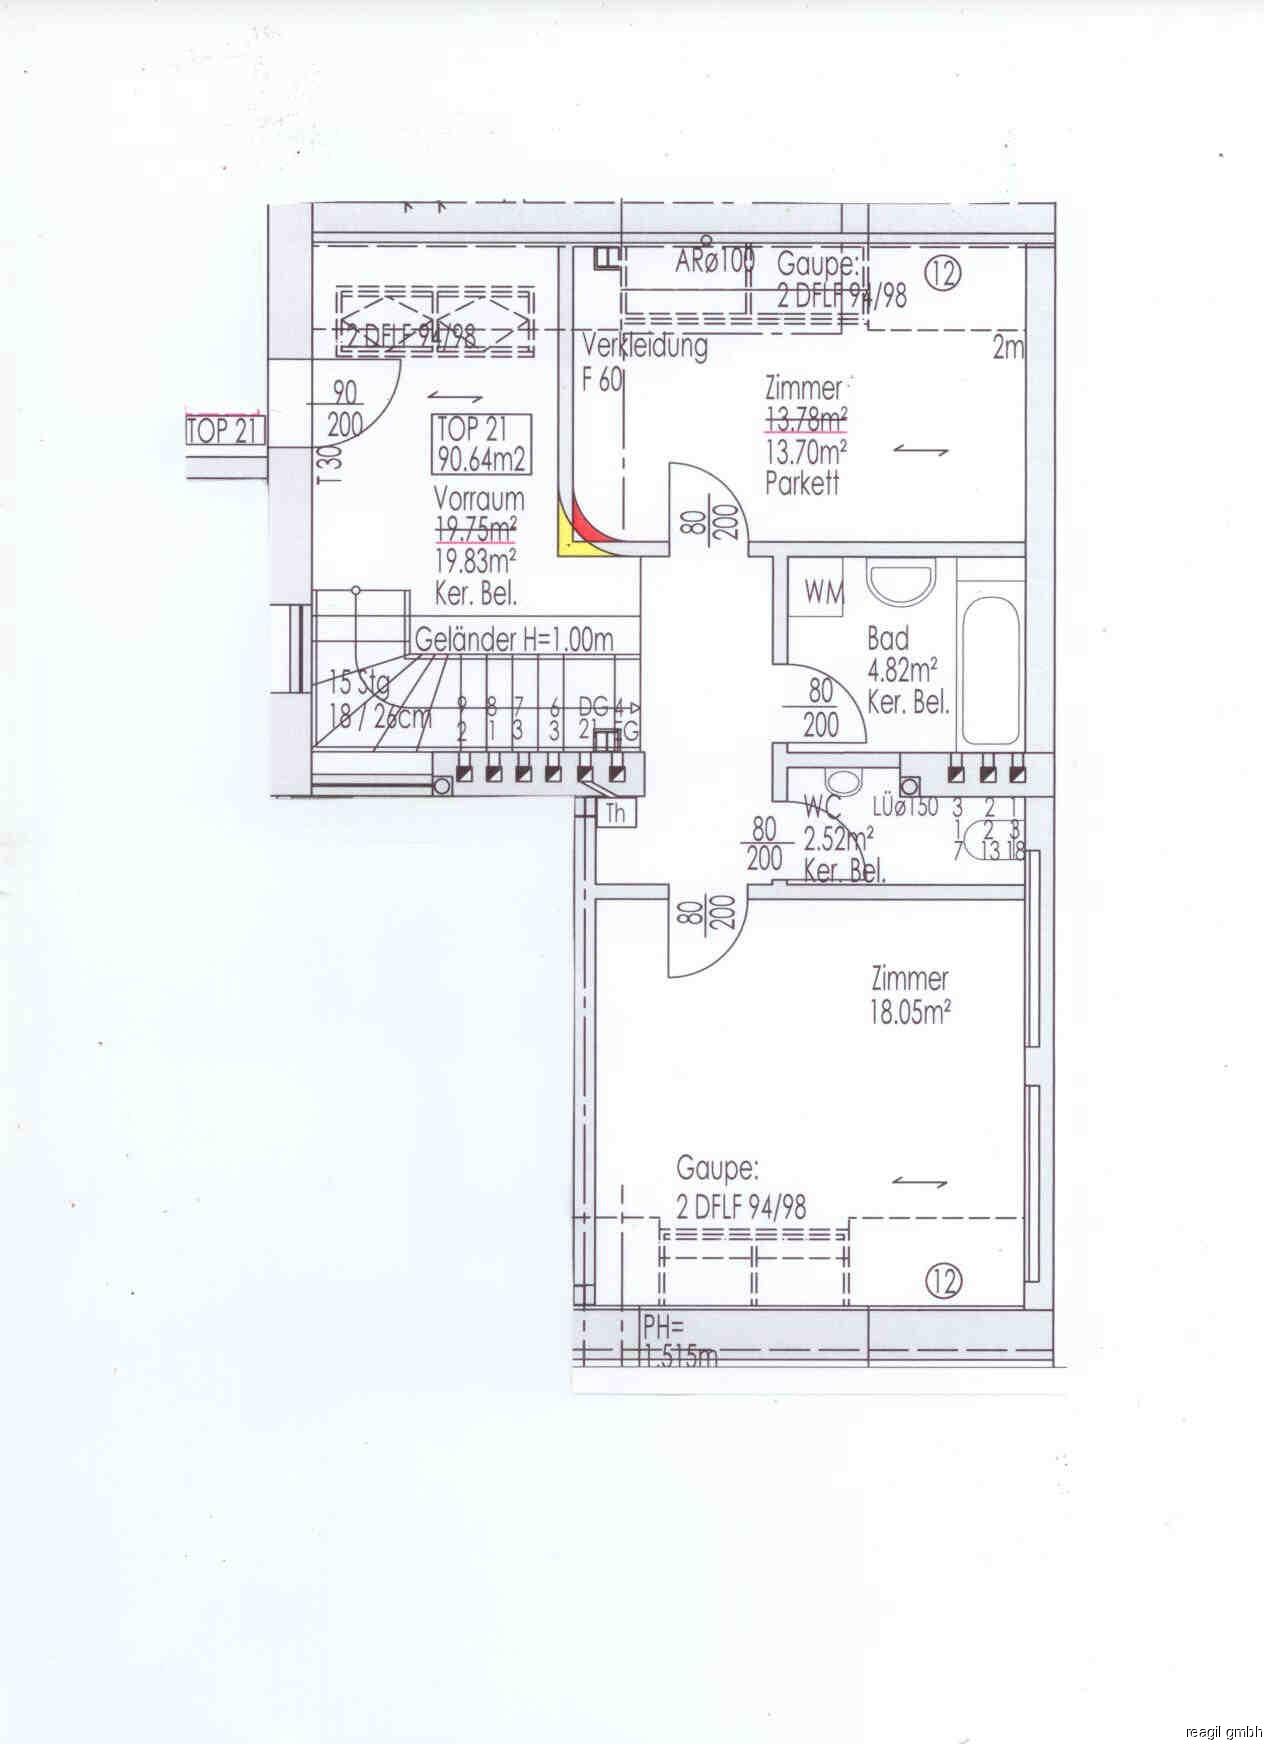 Plan Top 21 1.Ebene